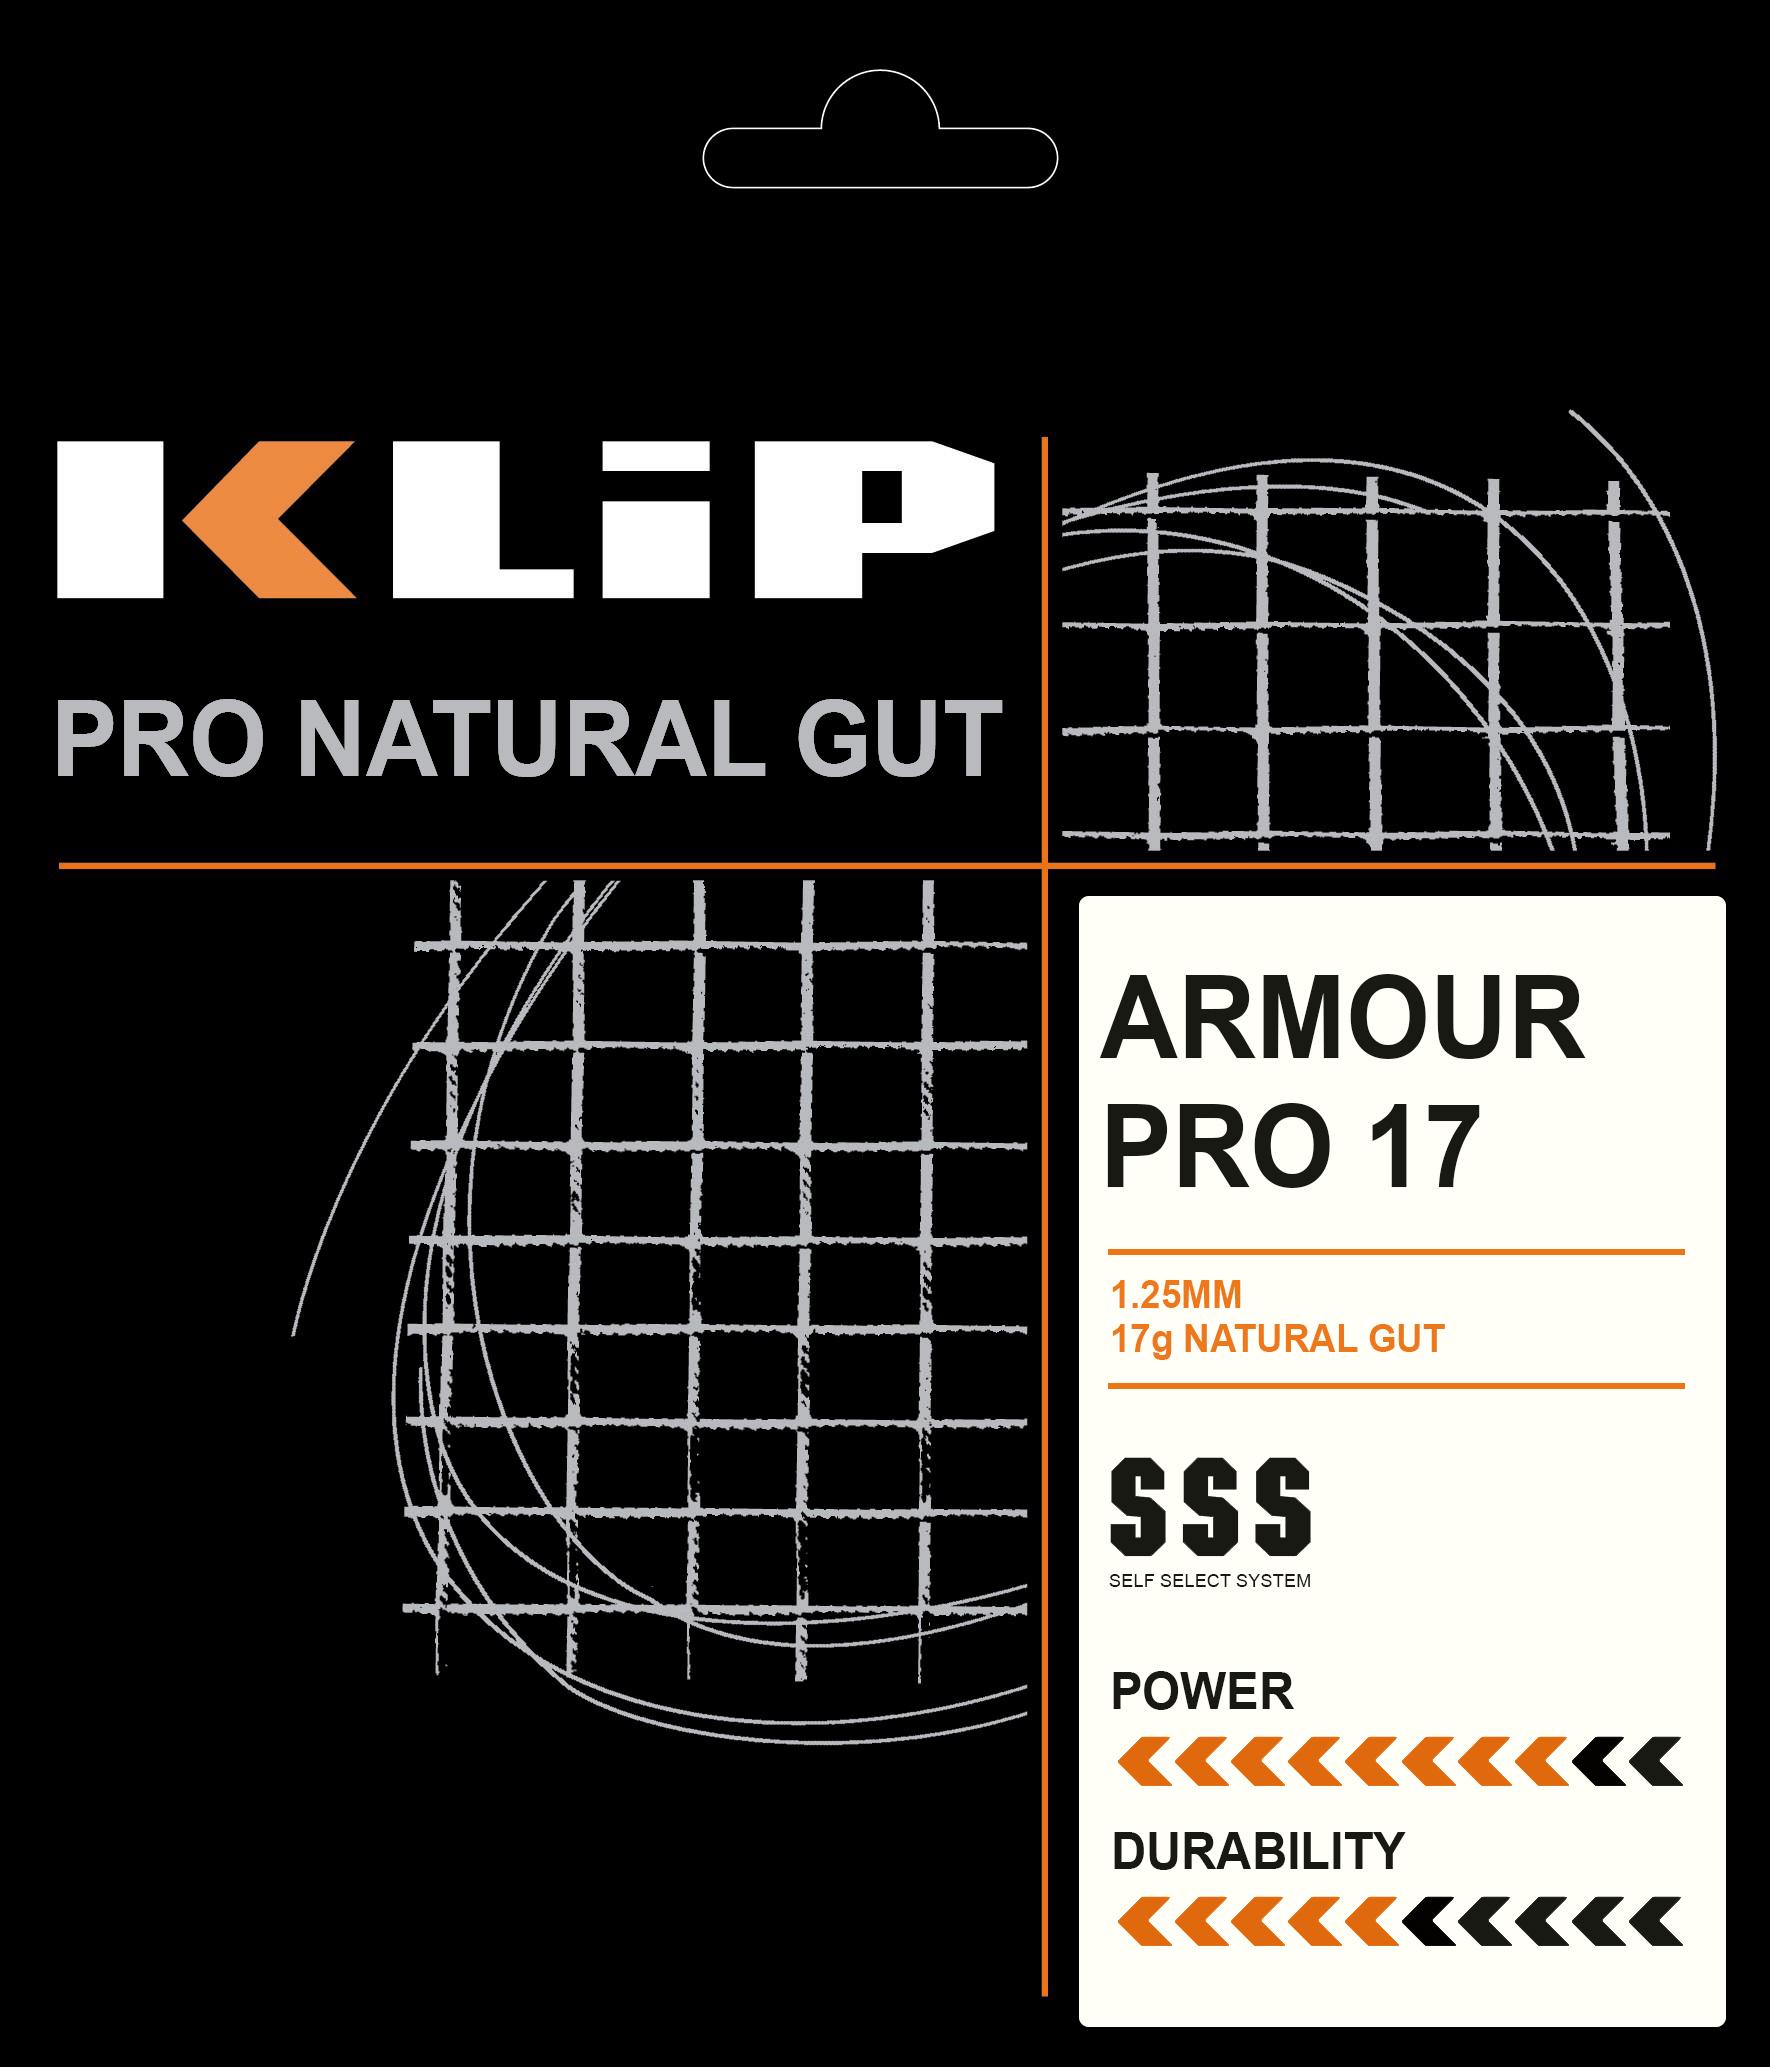 KLIP ARMOUR PRO 17